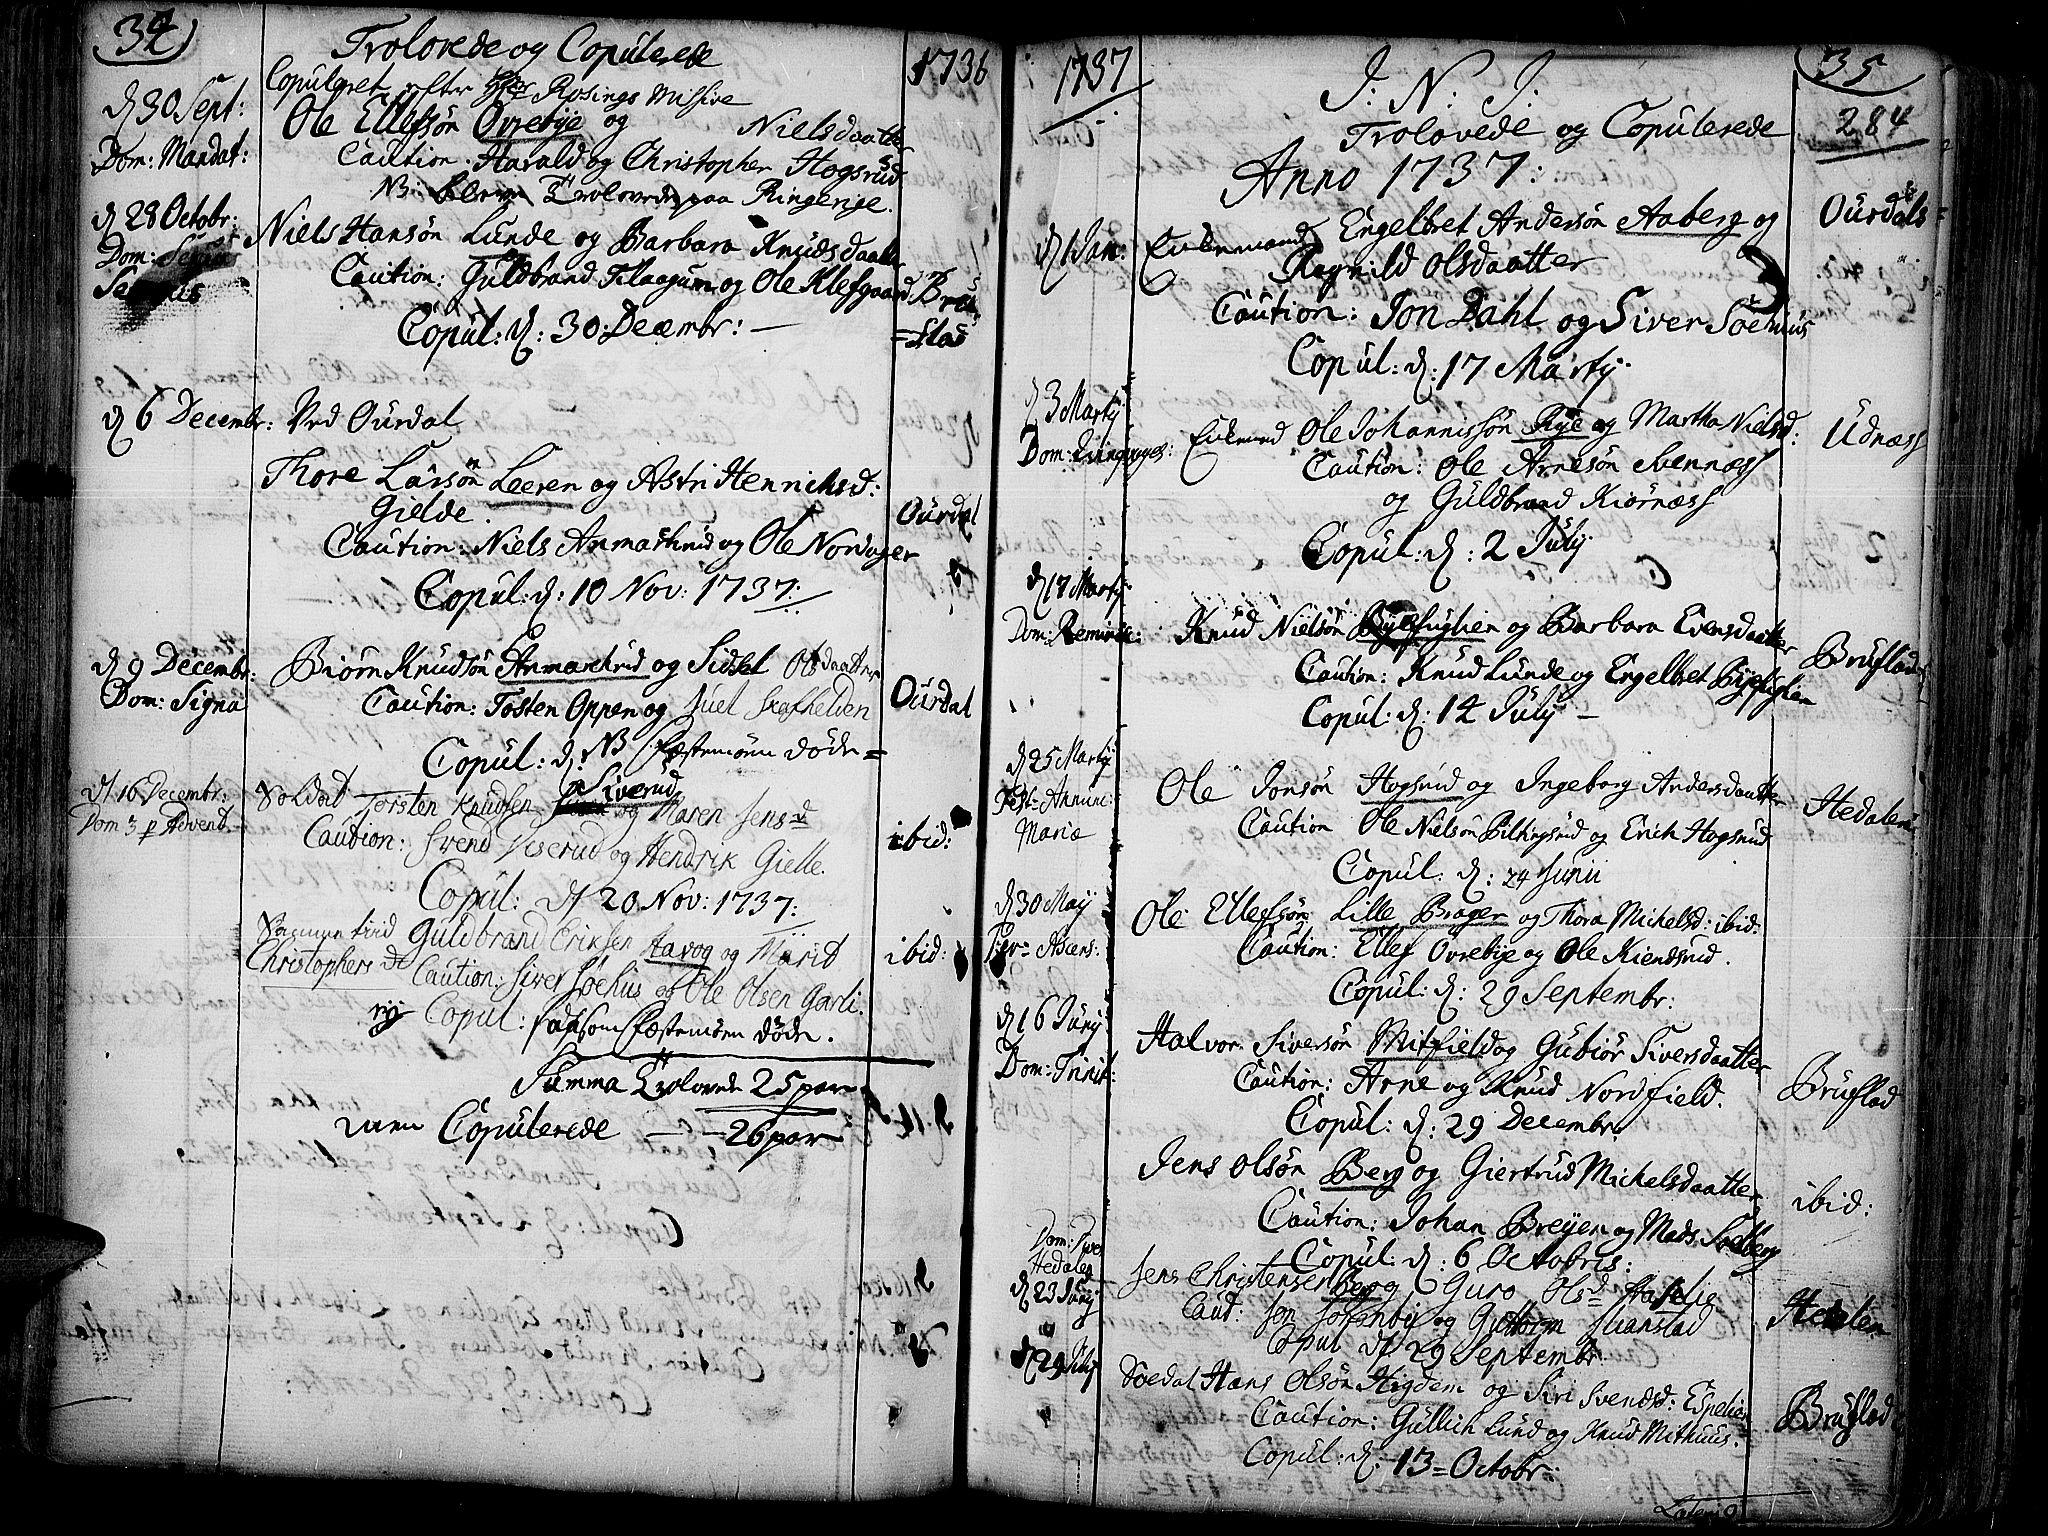 SAH, Aurdal prestekontor, Ministerialbok nr. 4, 1730-1762, s. 34-35